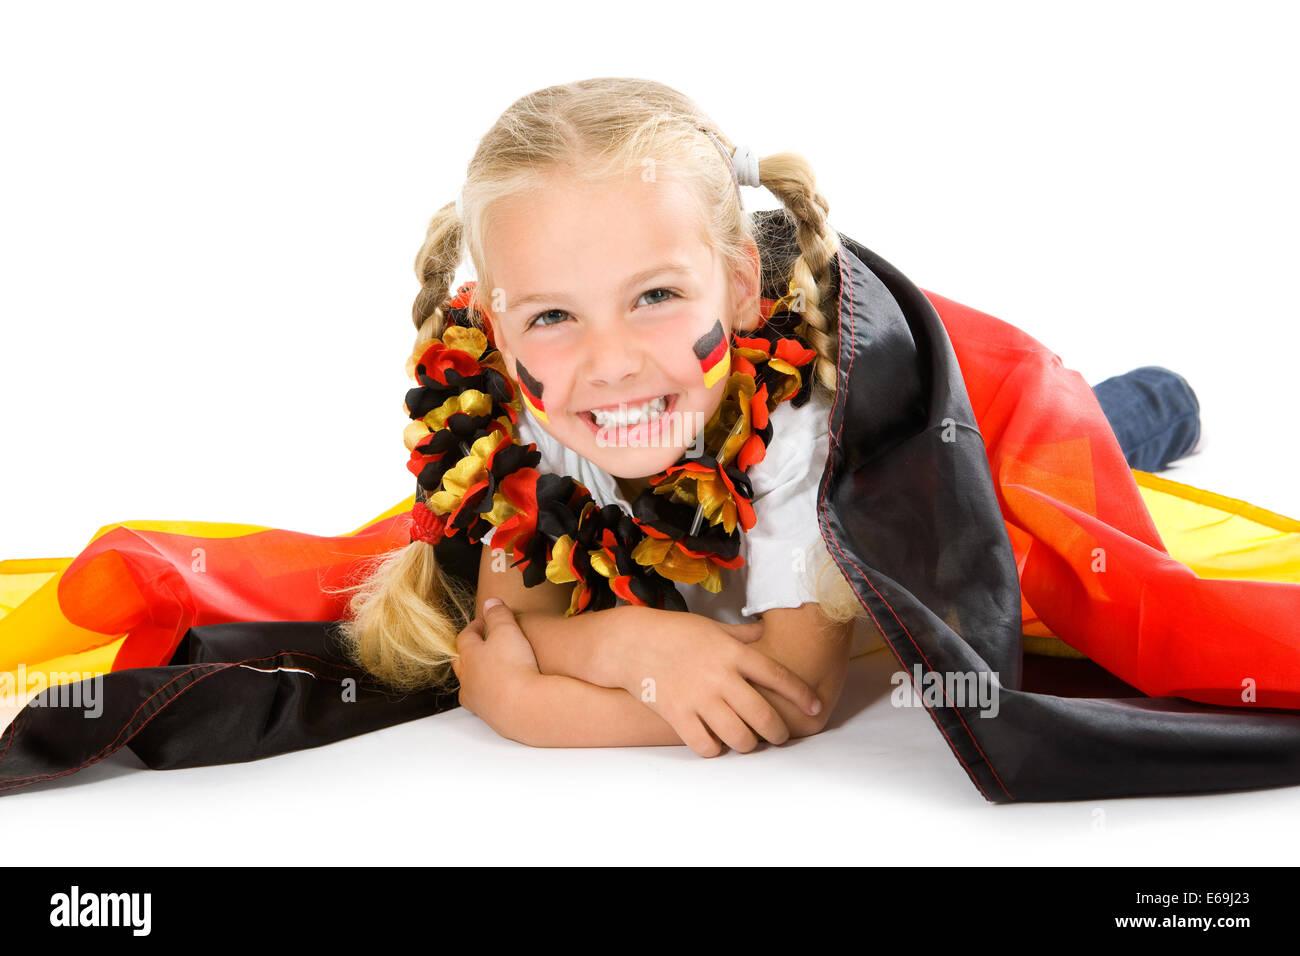 Ventilator, deutsche Kultur, Patriotismus, Mädchen, Fußball-fan Stockbild